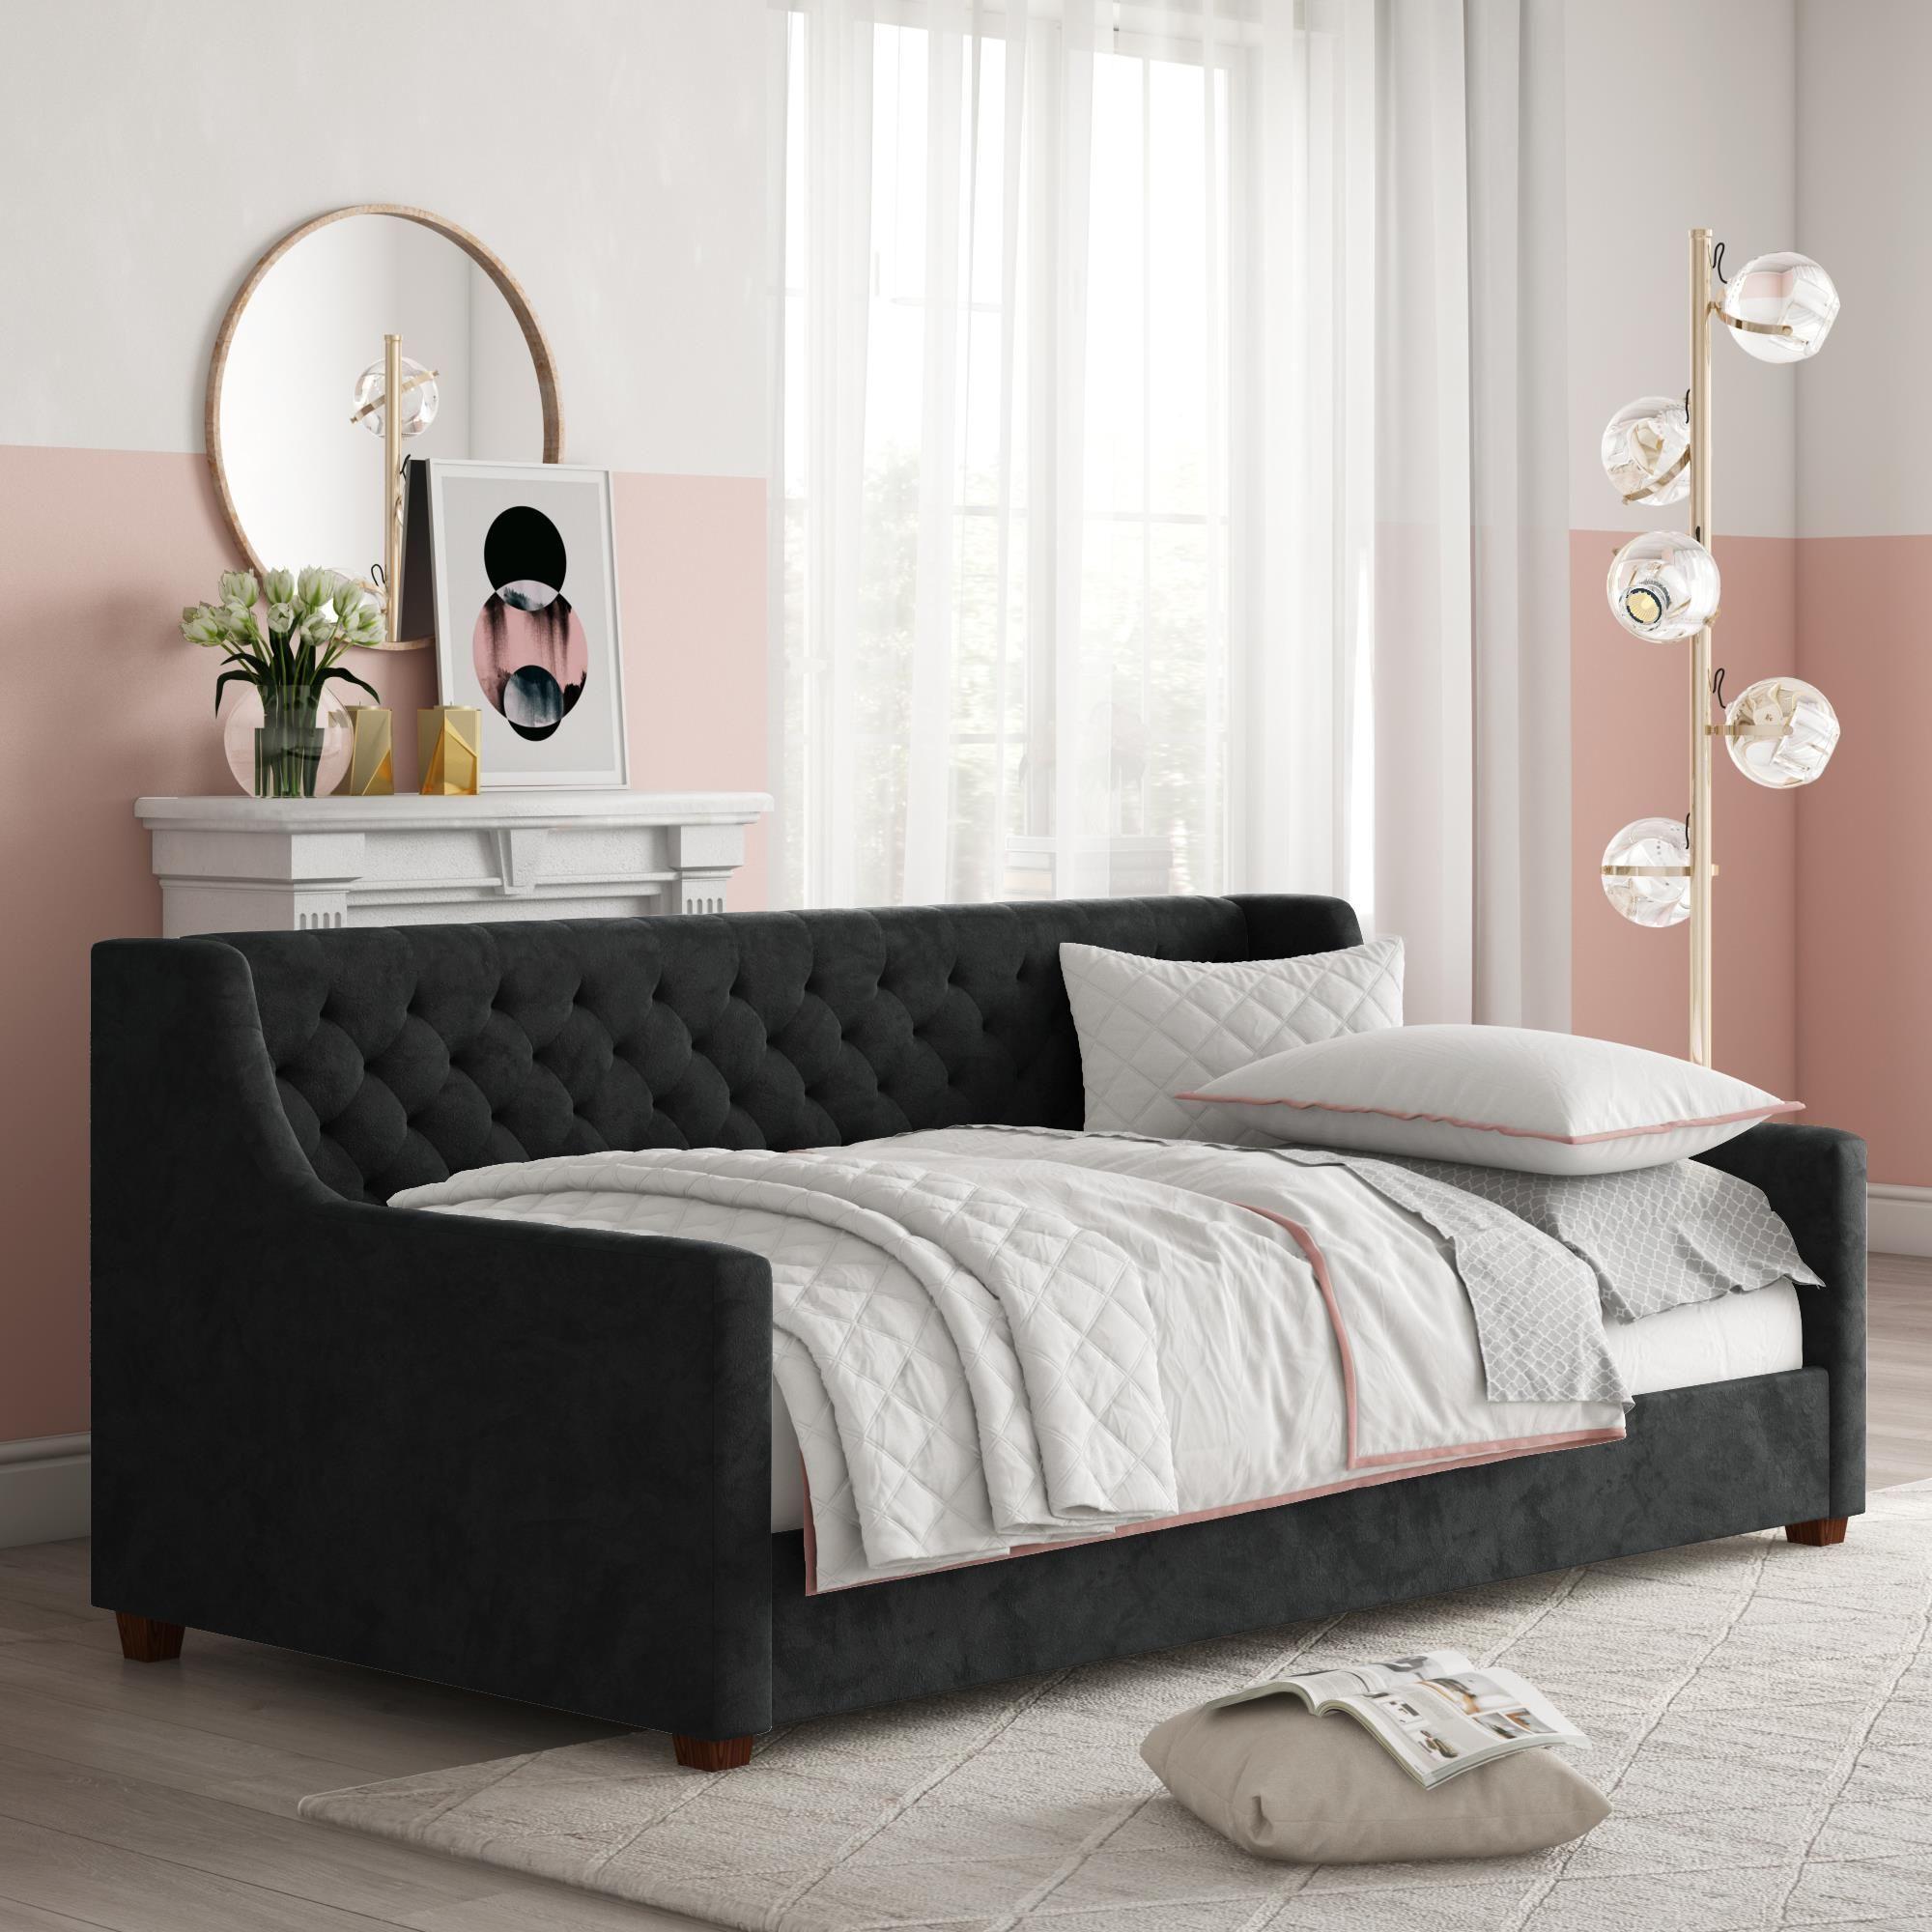 Dhp Jordyn Twin Size Upholstered Daybed Gray Velvet Walmart Com In 2020 Upholstered Daybed Sofa Bed Design Sofa Bed Frame